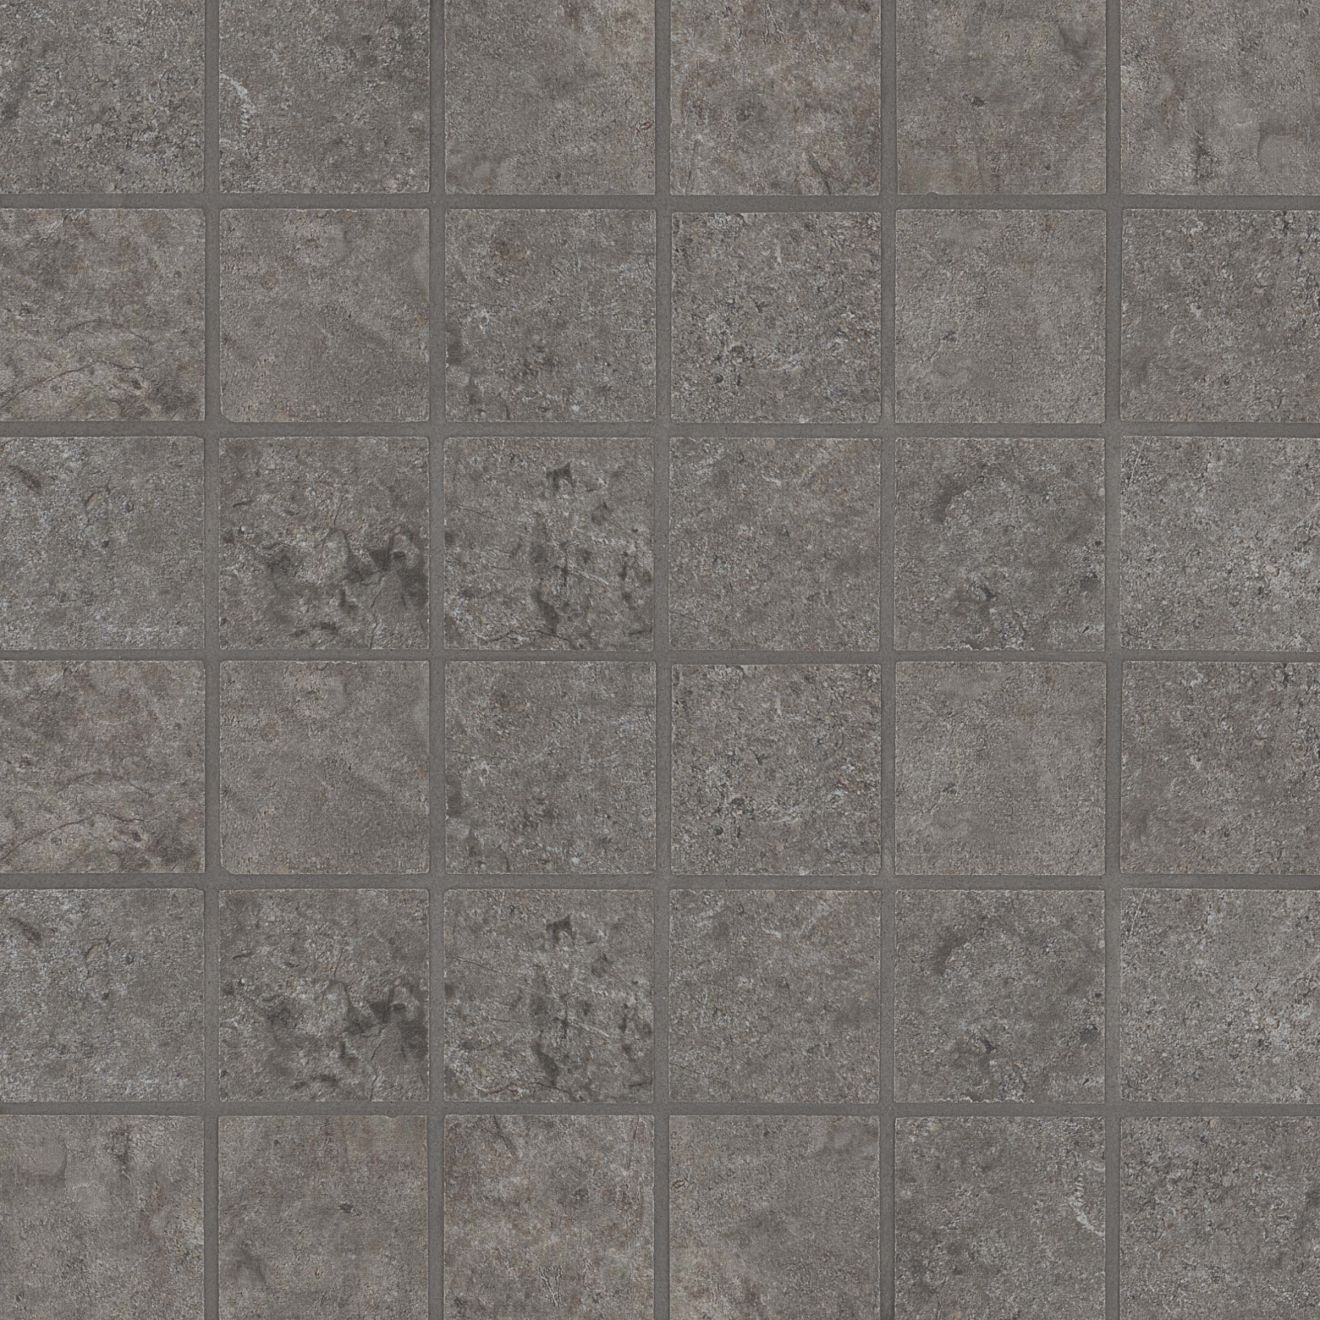 "Stone Valley 2"" x 2"" Floor & Wall Mosaic in Terra"